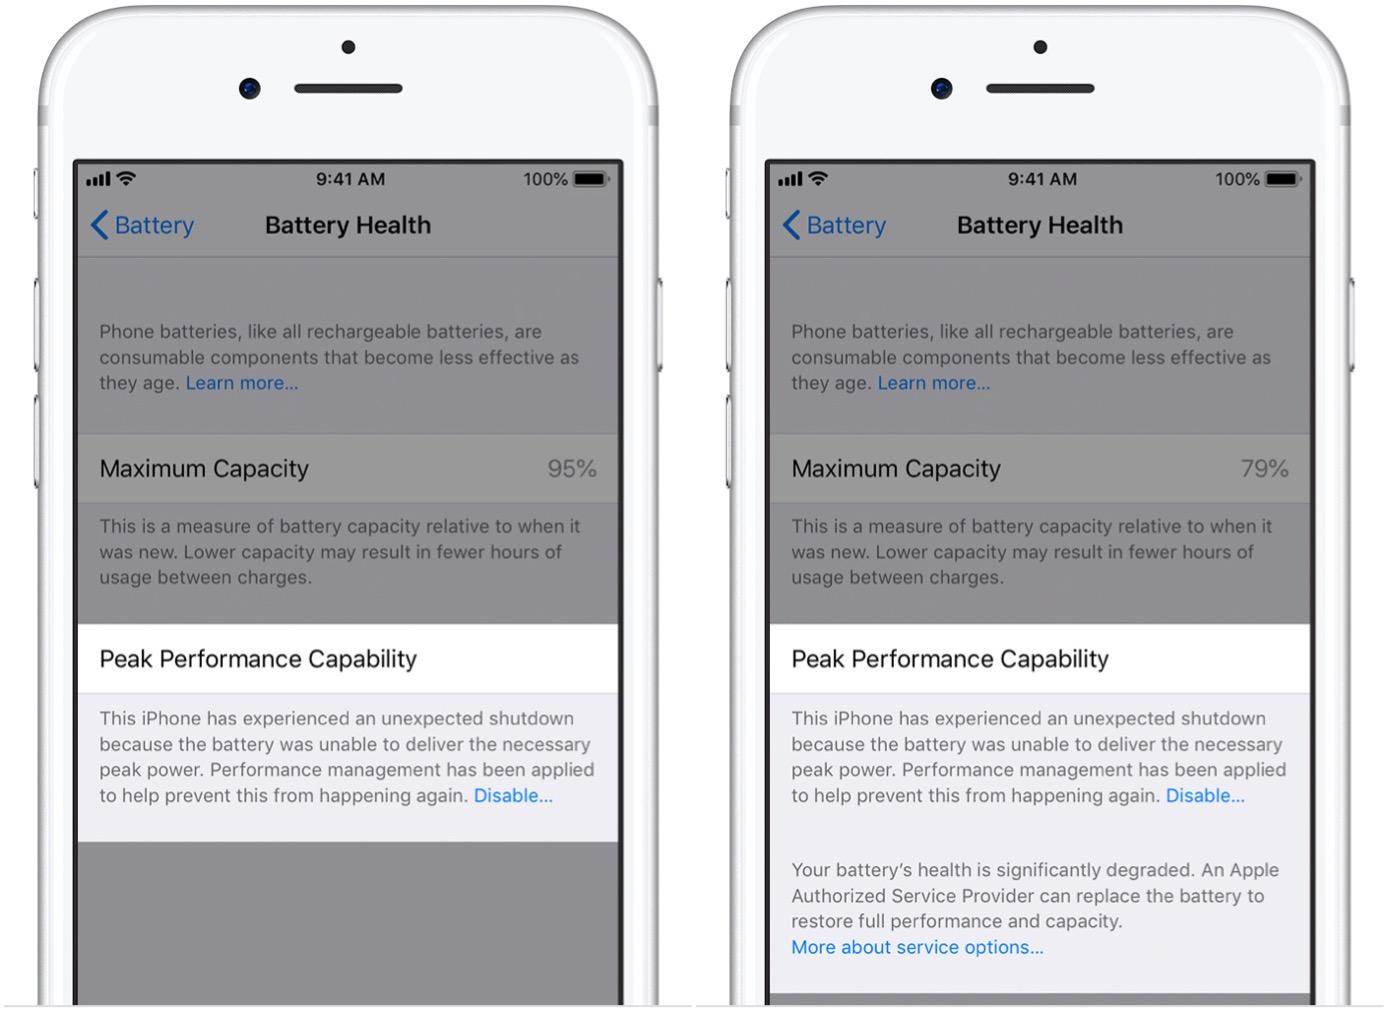 iPhone-battery-performance.jpg